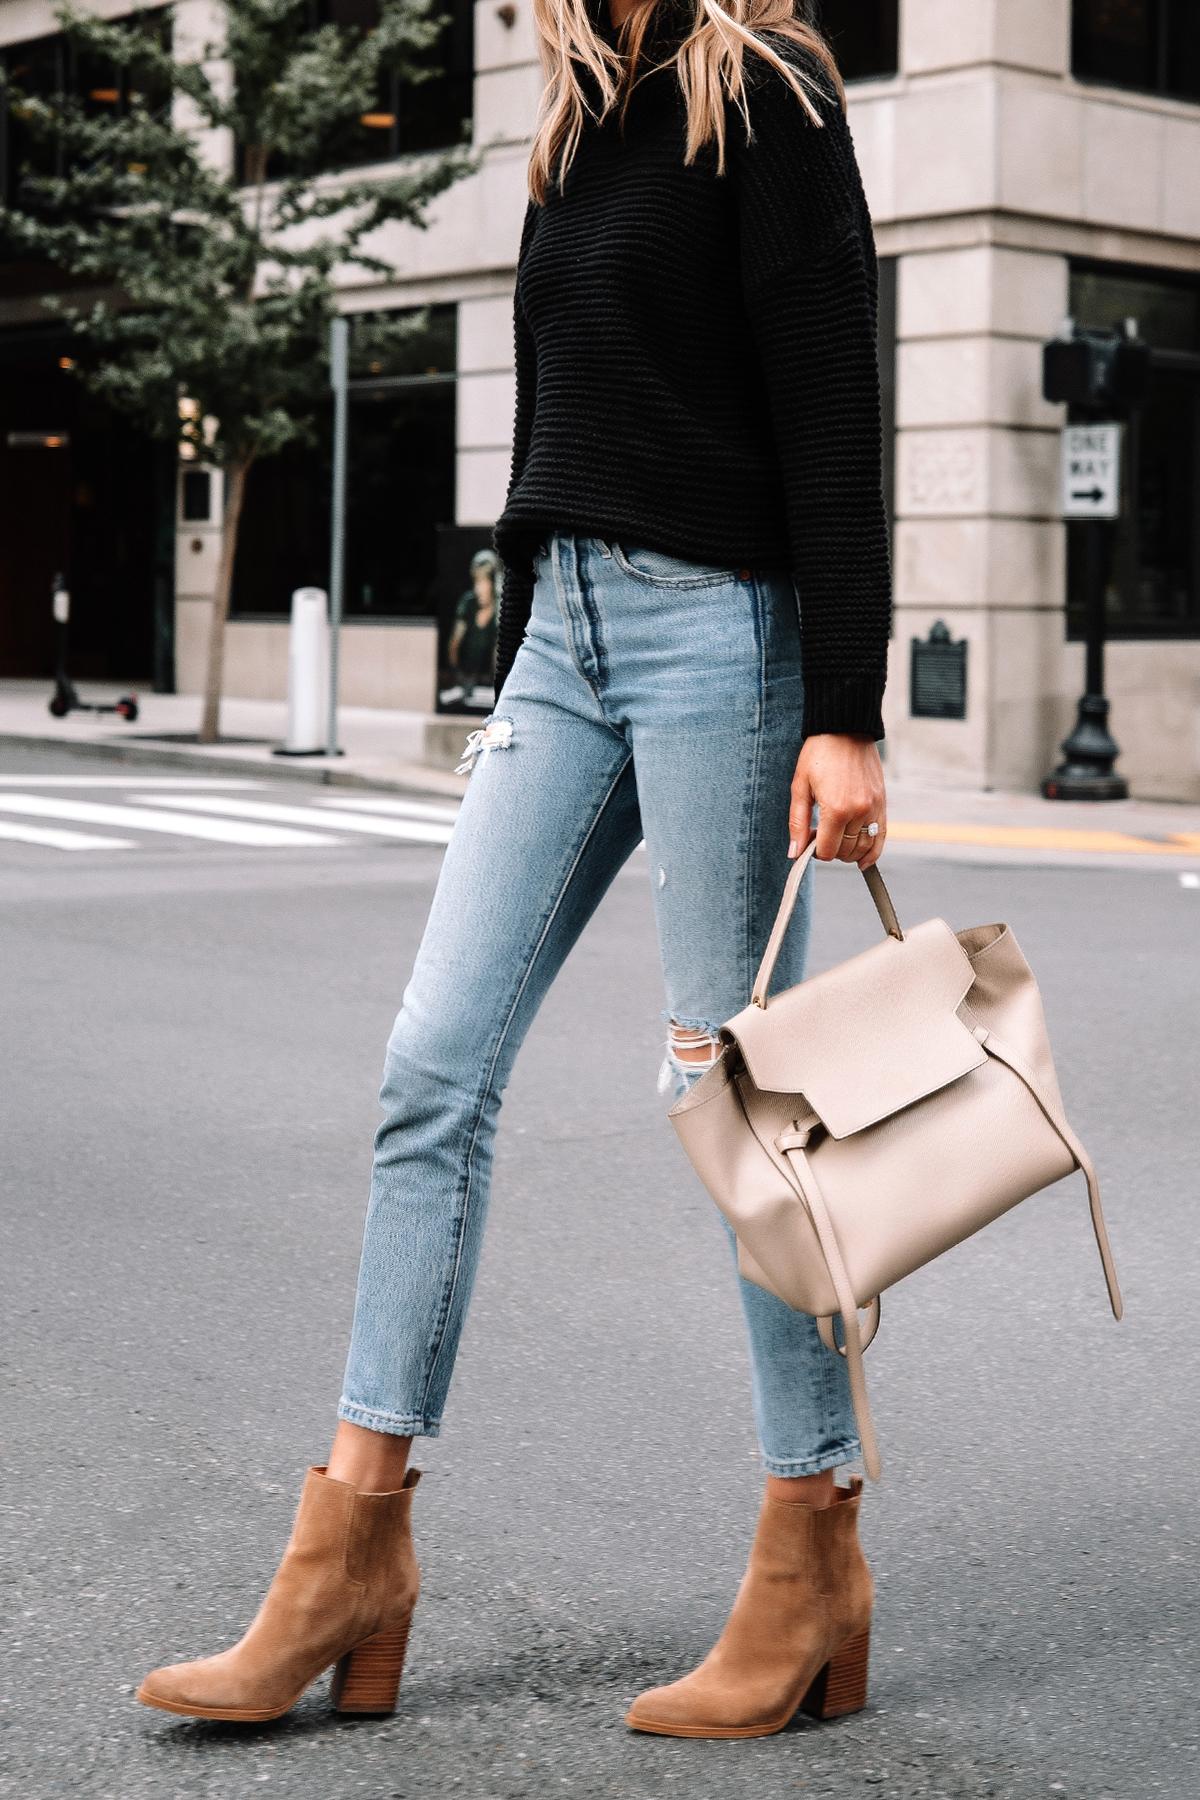 Fashion Jackson Wearing Amazon Fashion Black Turtleneck Sweater Levis Ripped Jeans Tan Suede Booties 4